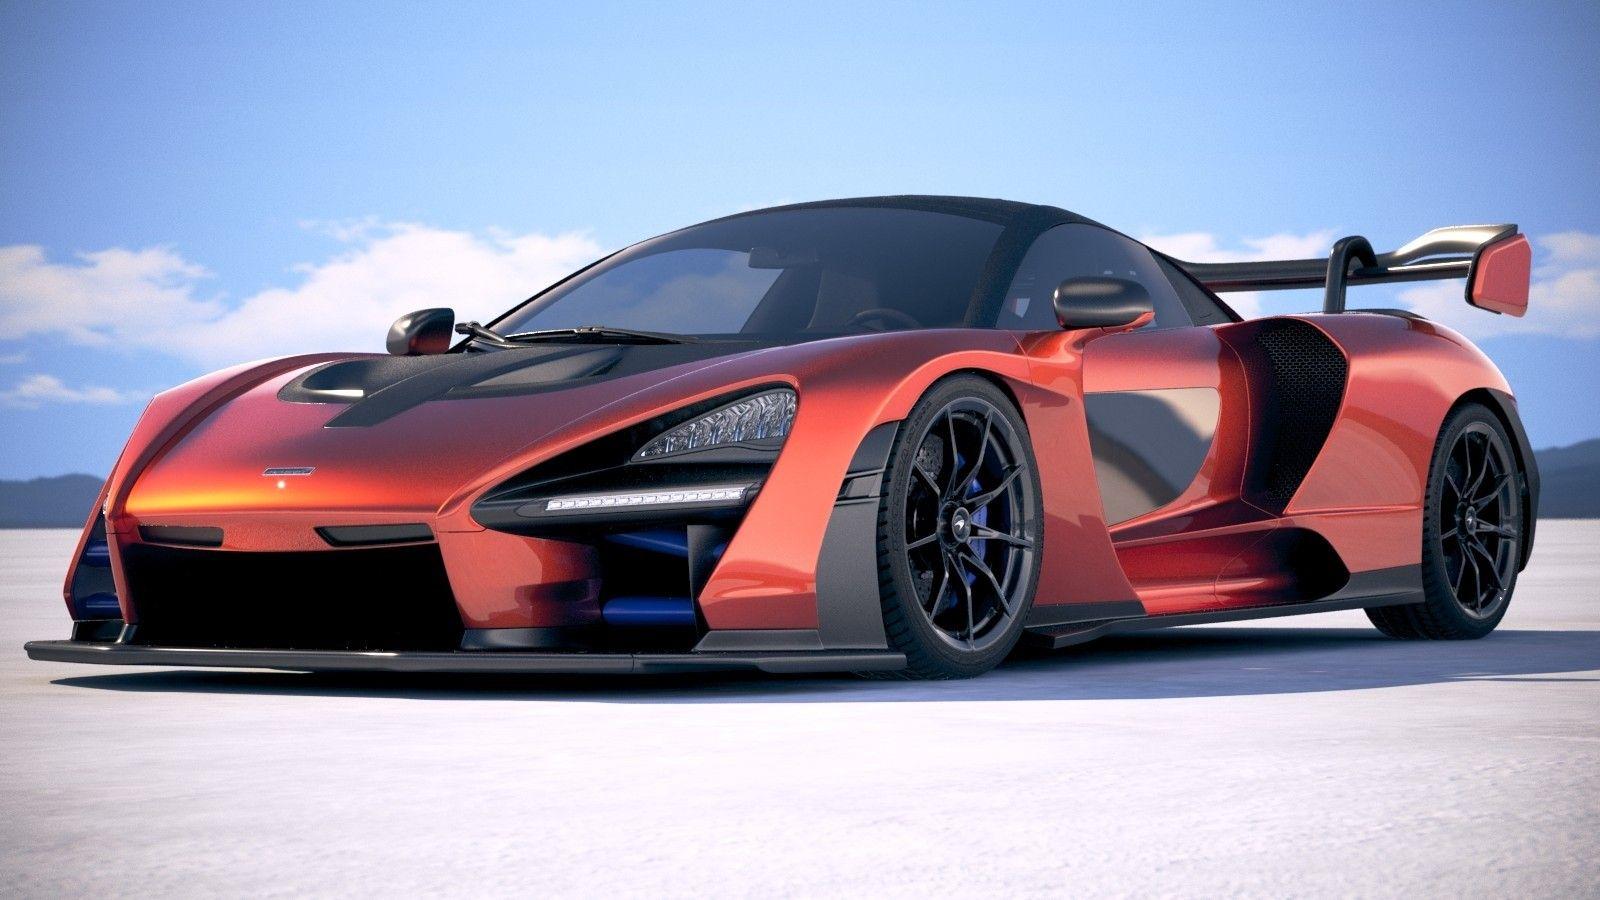 The Most Powerful Cars In The World Cars Powerful World Bugatti Cars Sports Cars Lamborghini Car In The World